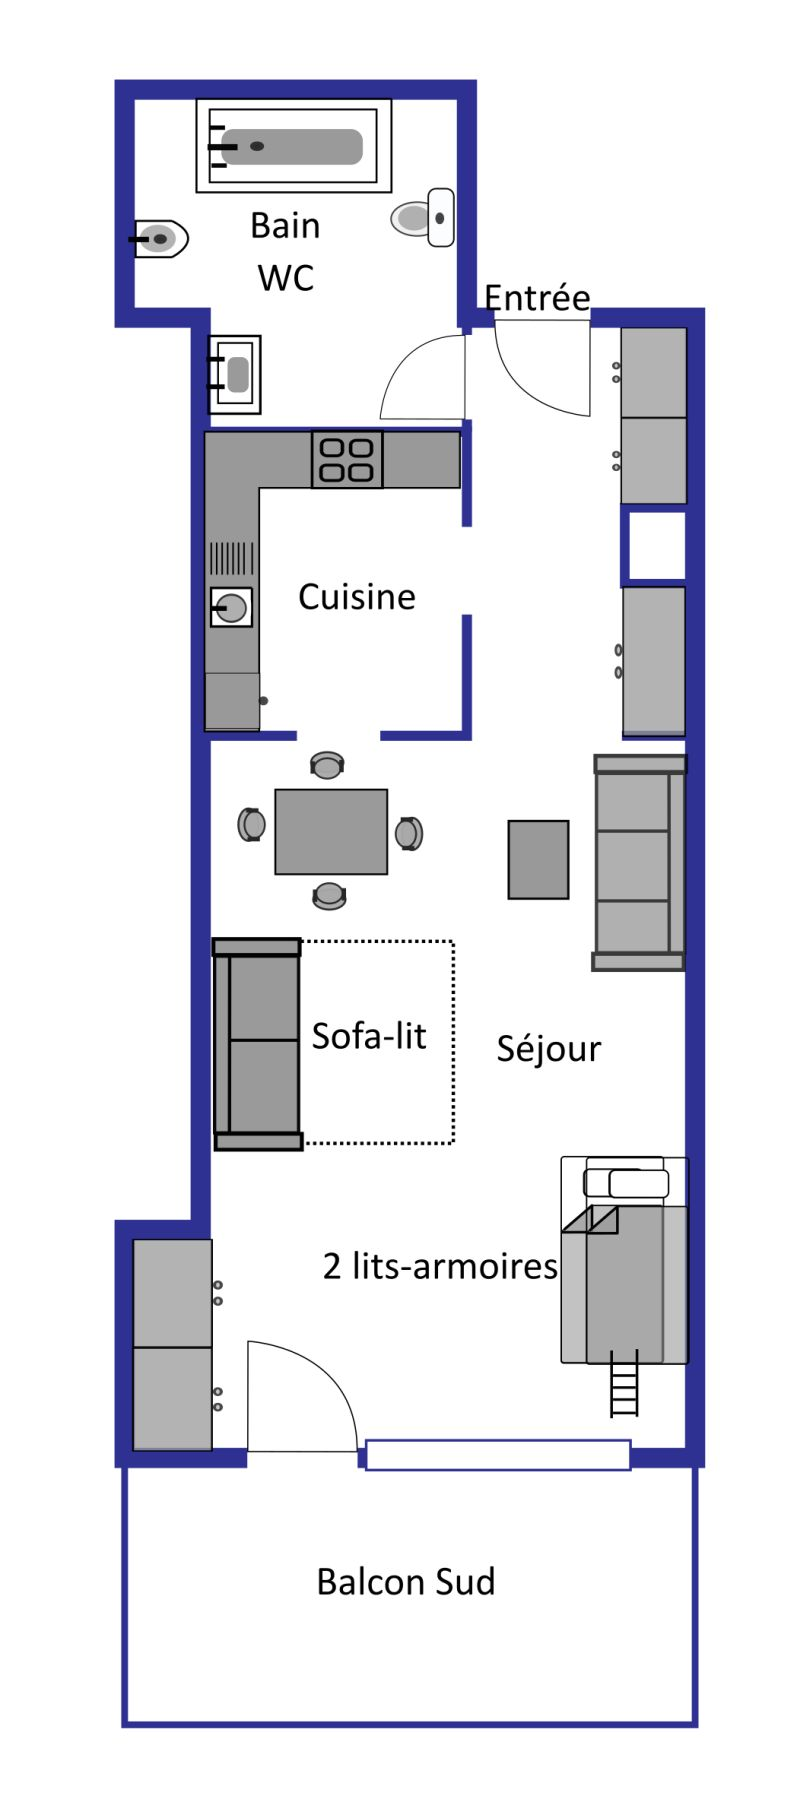 Mondzeu B240 layout